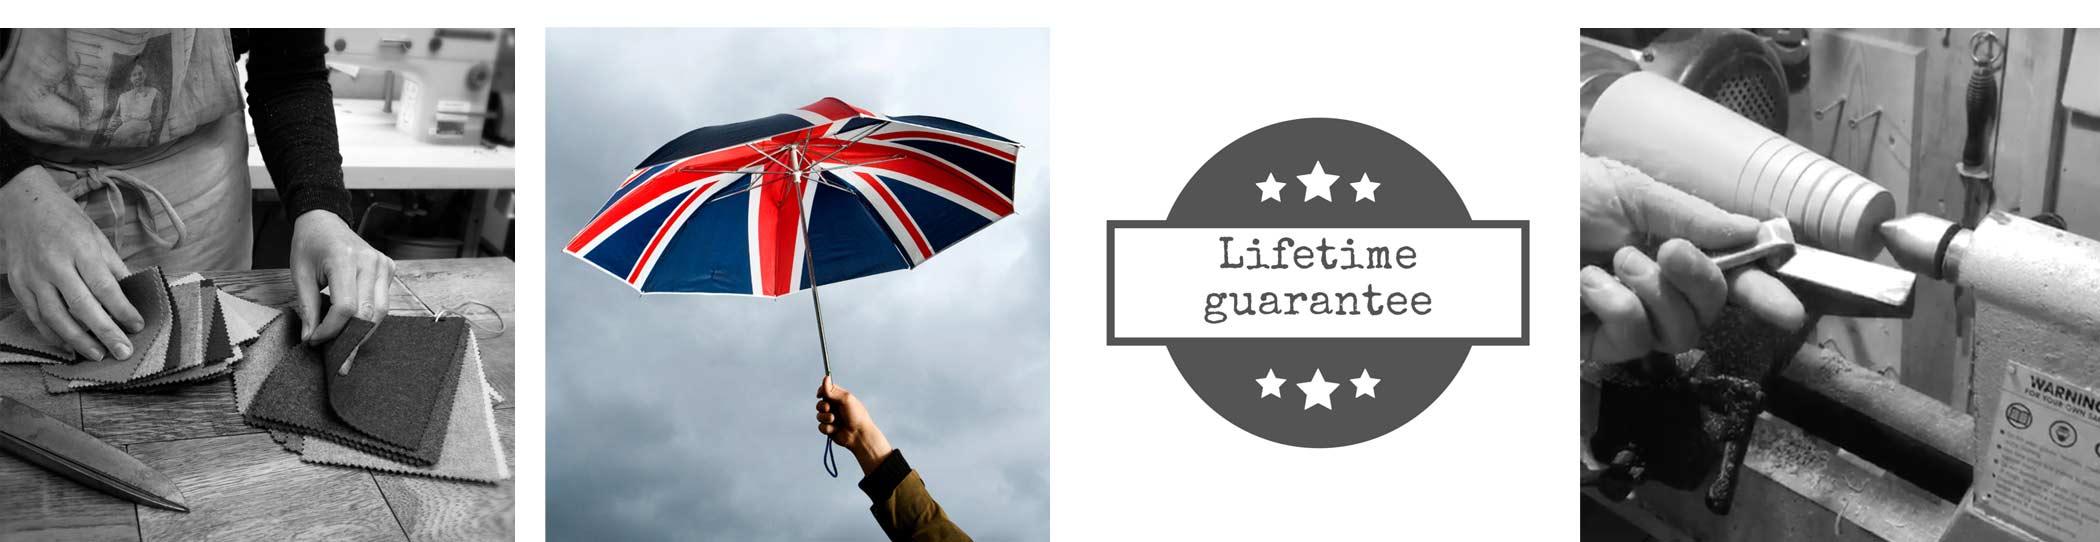 Lifetime guarantee image